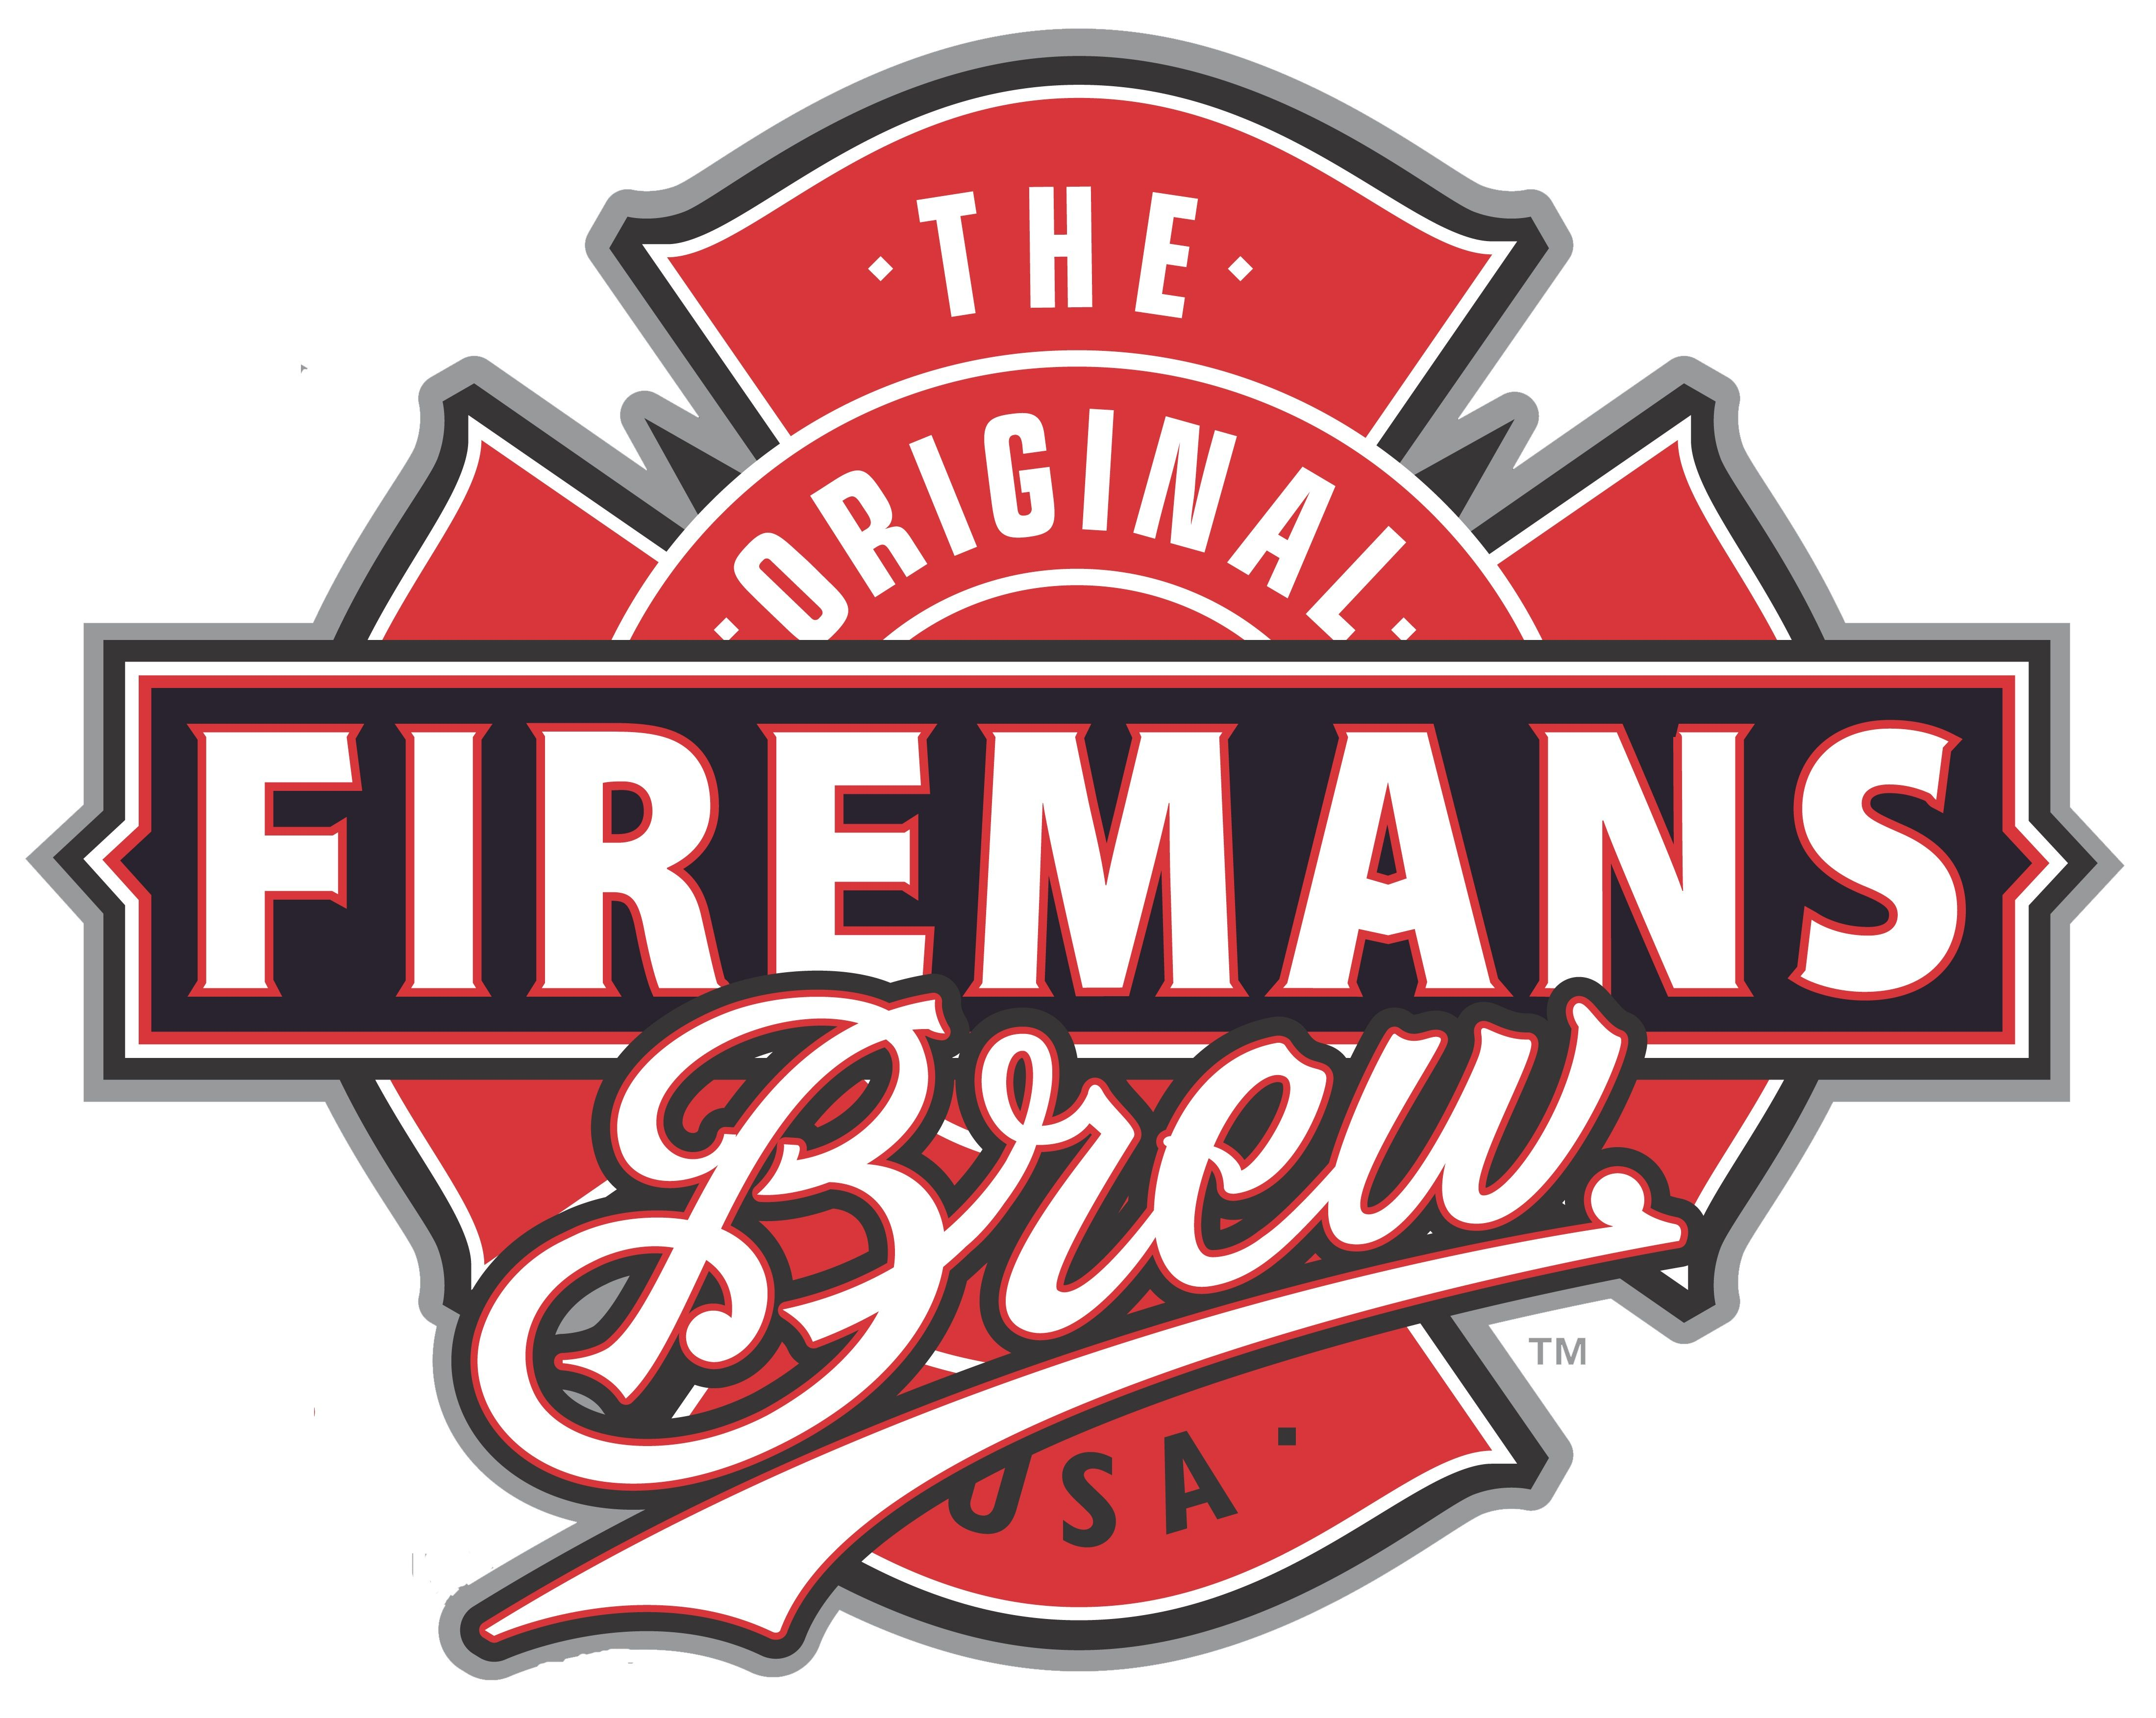 Fireman's Brew logo Brewing, Logos, Craft brewing